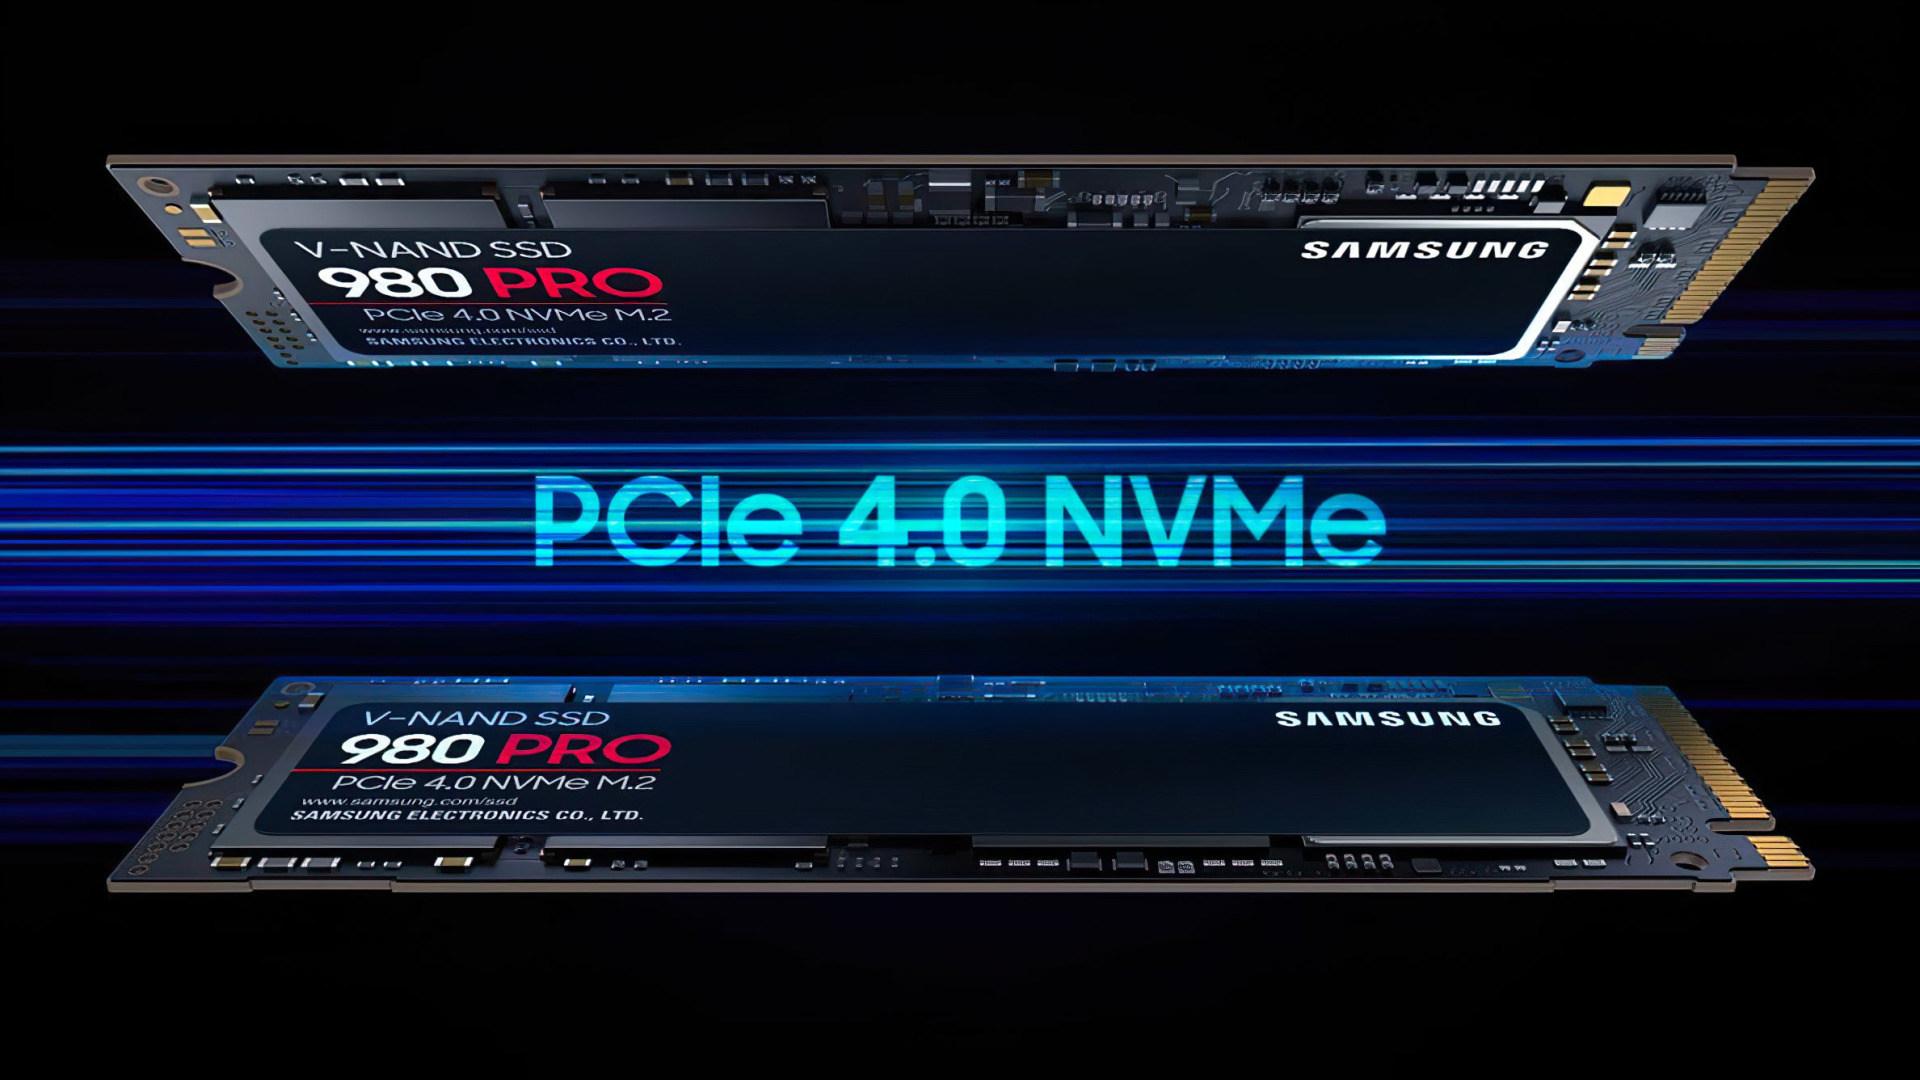 Samsung, Speicher, Ssd, Flash, Solid State Drive, NVMe, M.2, PCIe 4.0, V-Nand, Samsung 980 Pro